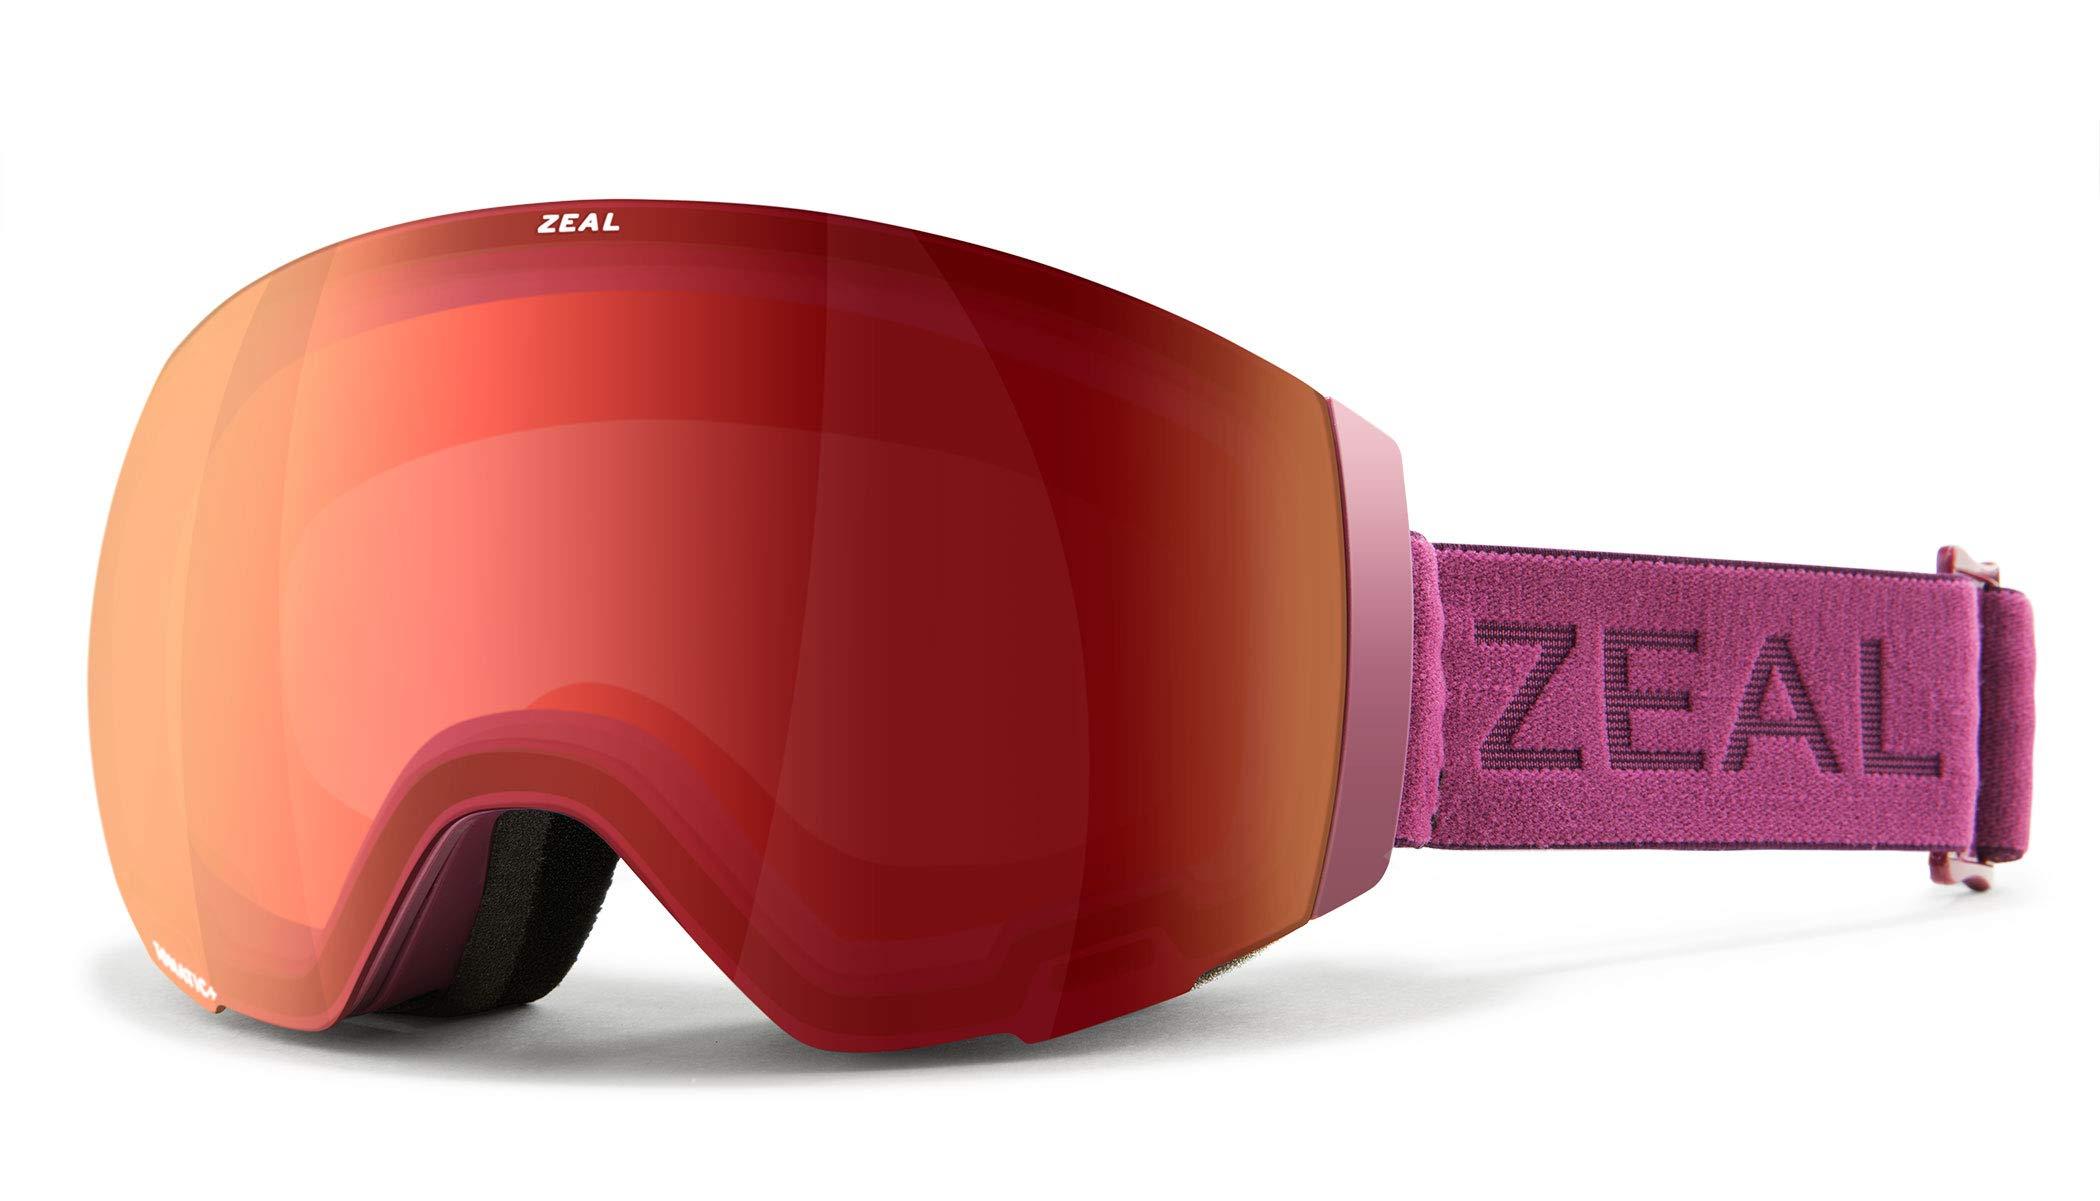 Zeal Optics Portal - Frameless Ski & Snowboard Goggles for Men & Women, Rail Lock System Goggles